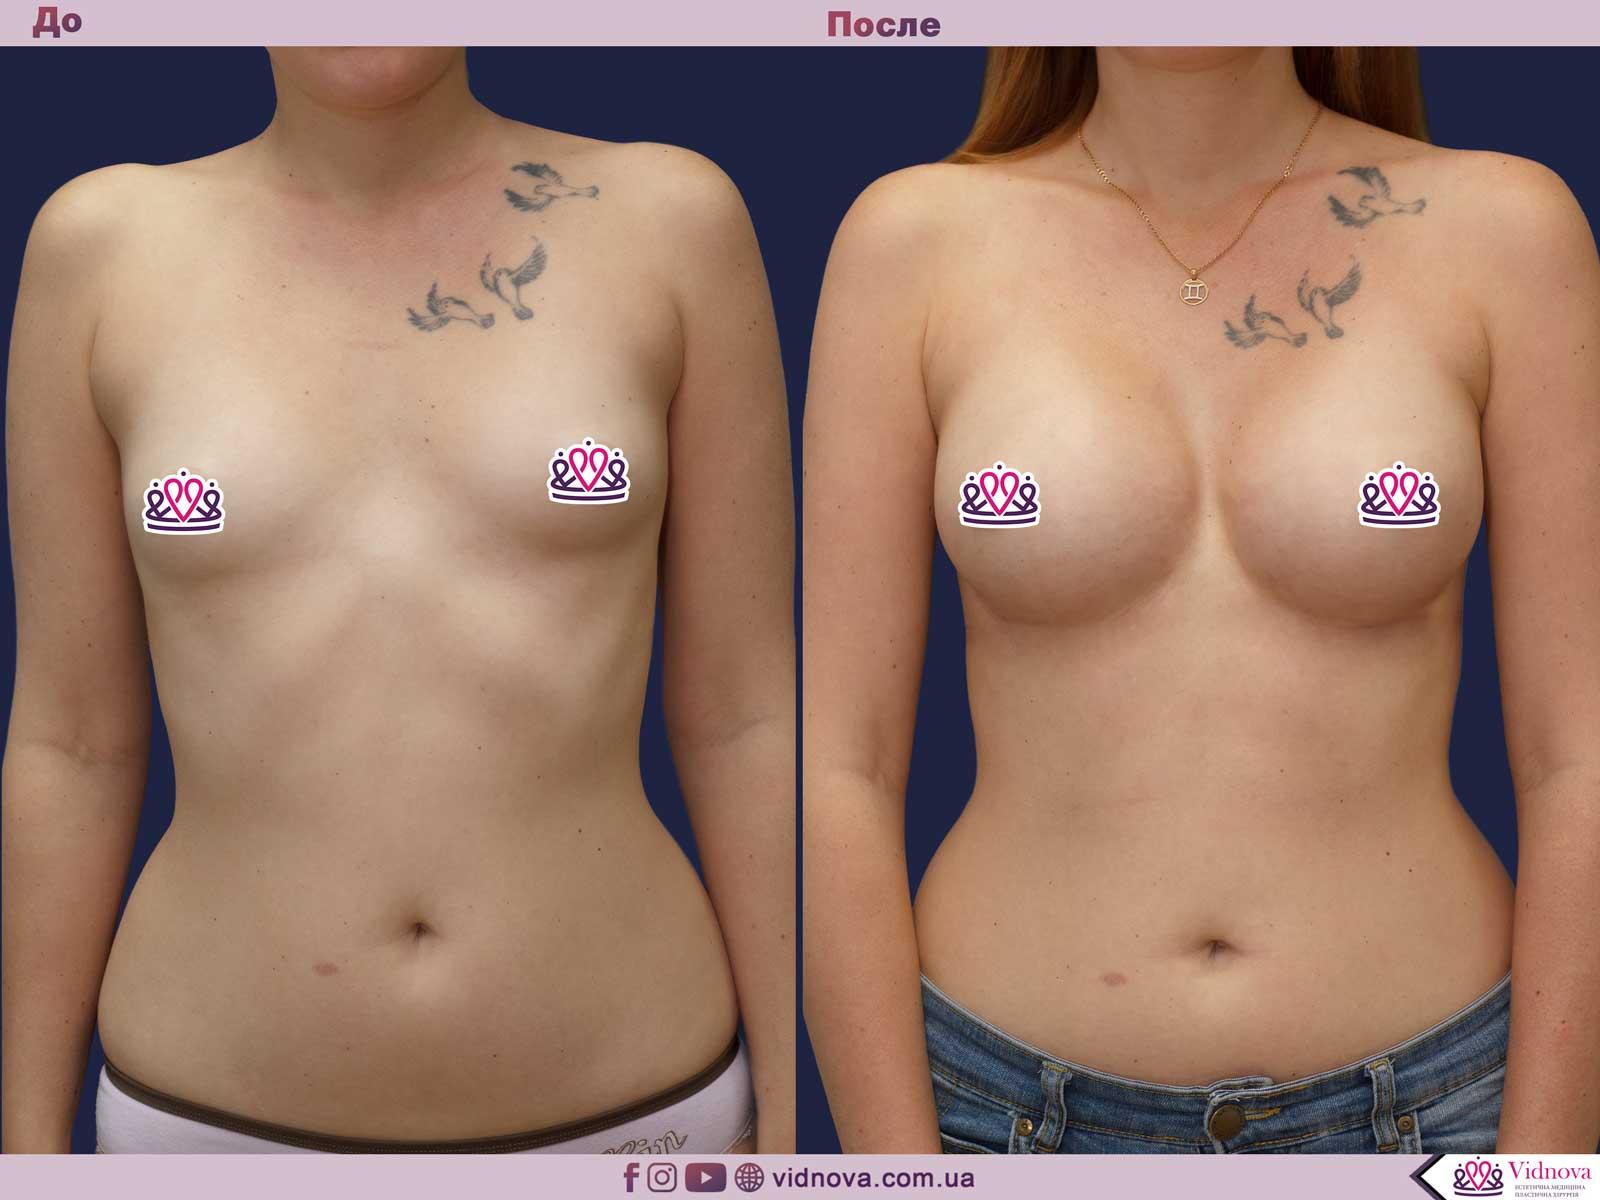 Увеличение груди: Фото ДО и ПОСЛЕ - Пример №55-1 - Клиника Vidnova